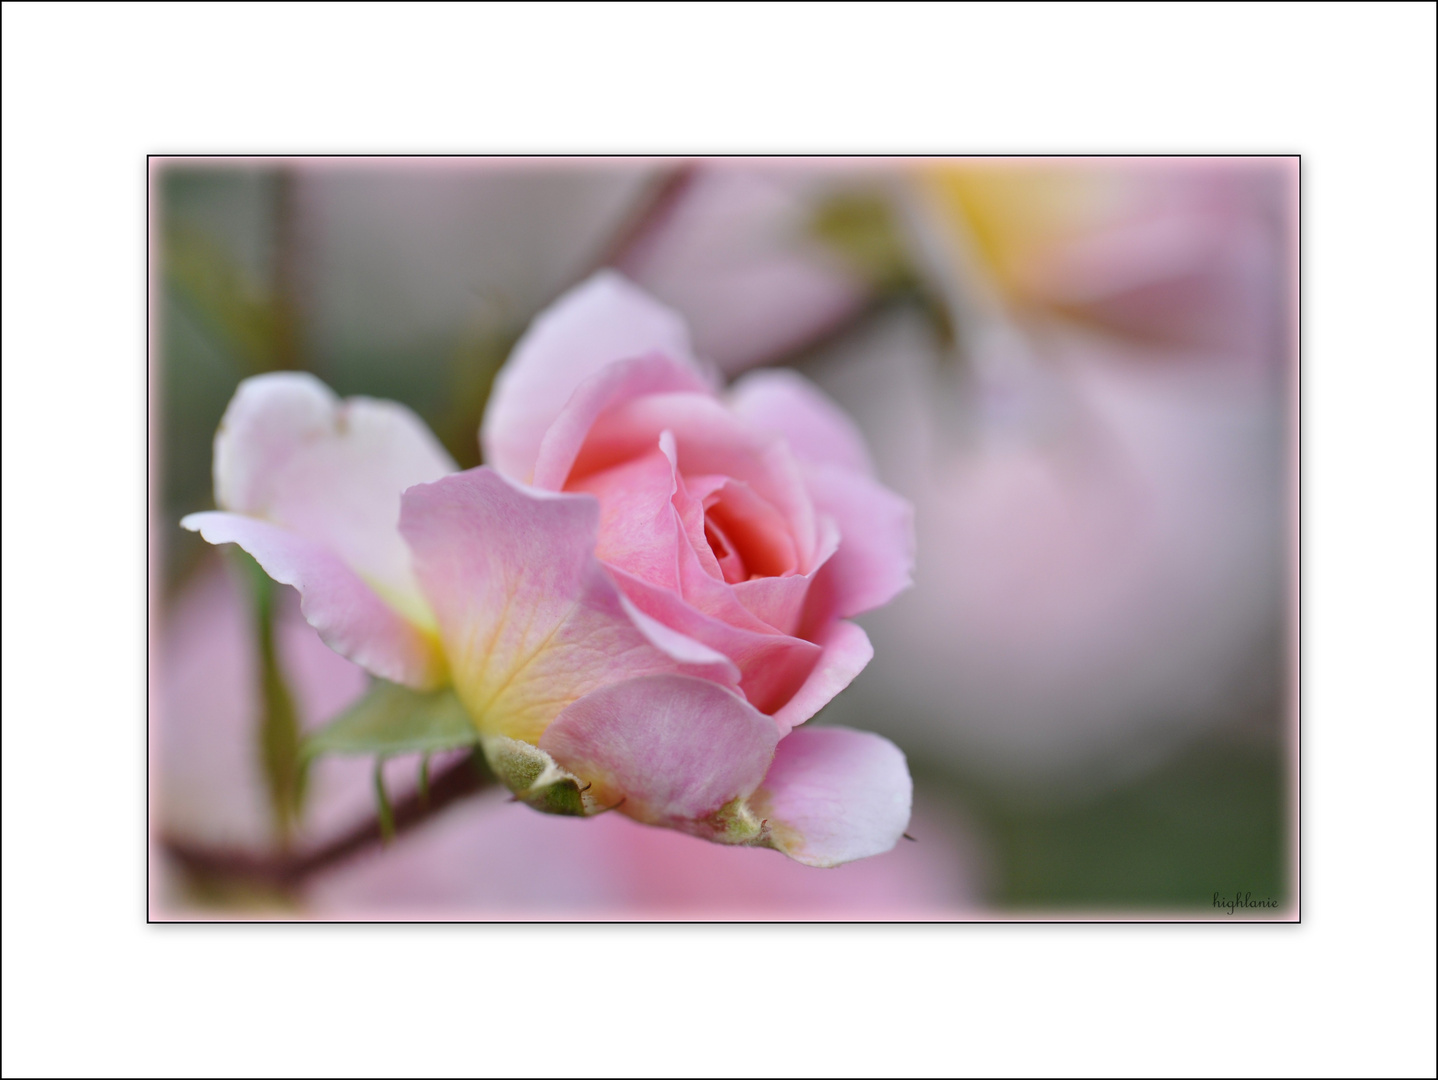 Rosarose